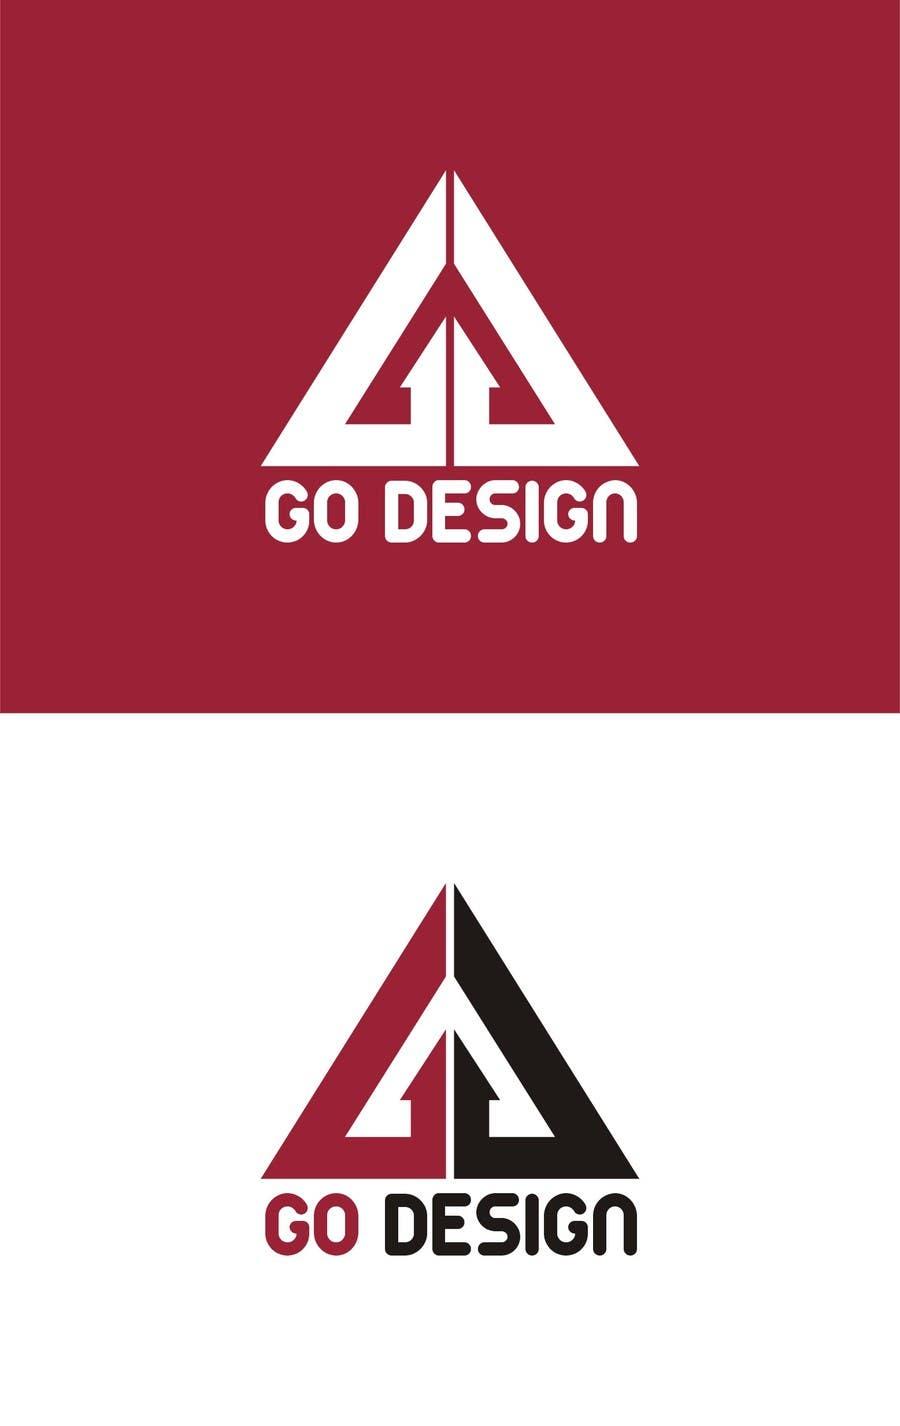 Konkurrenceindlæg #182 for Design a Logo for Go Design